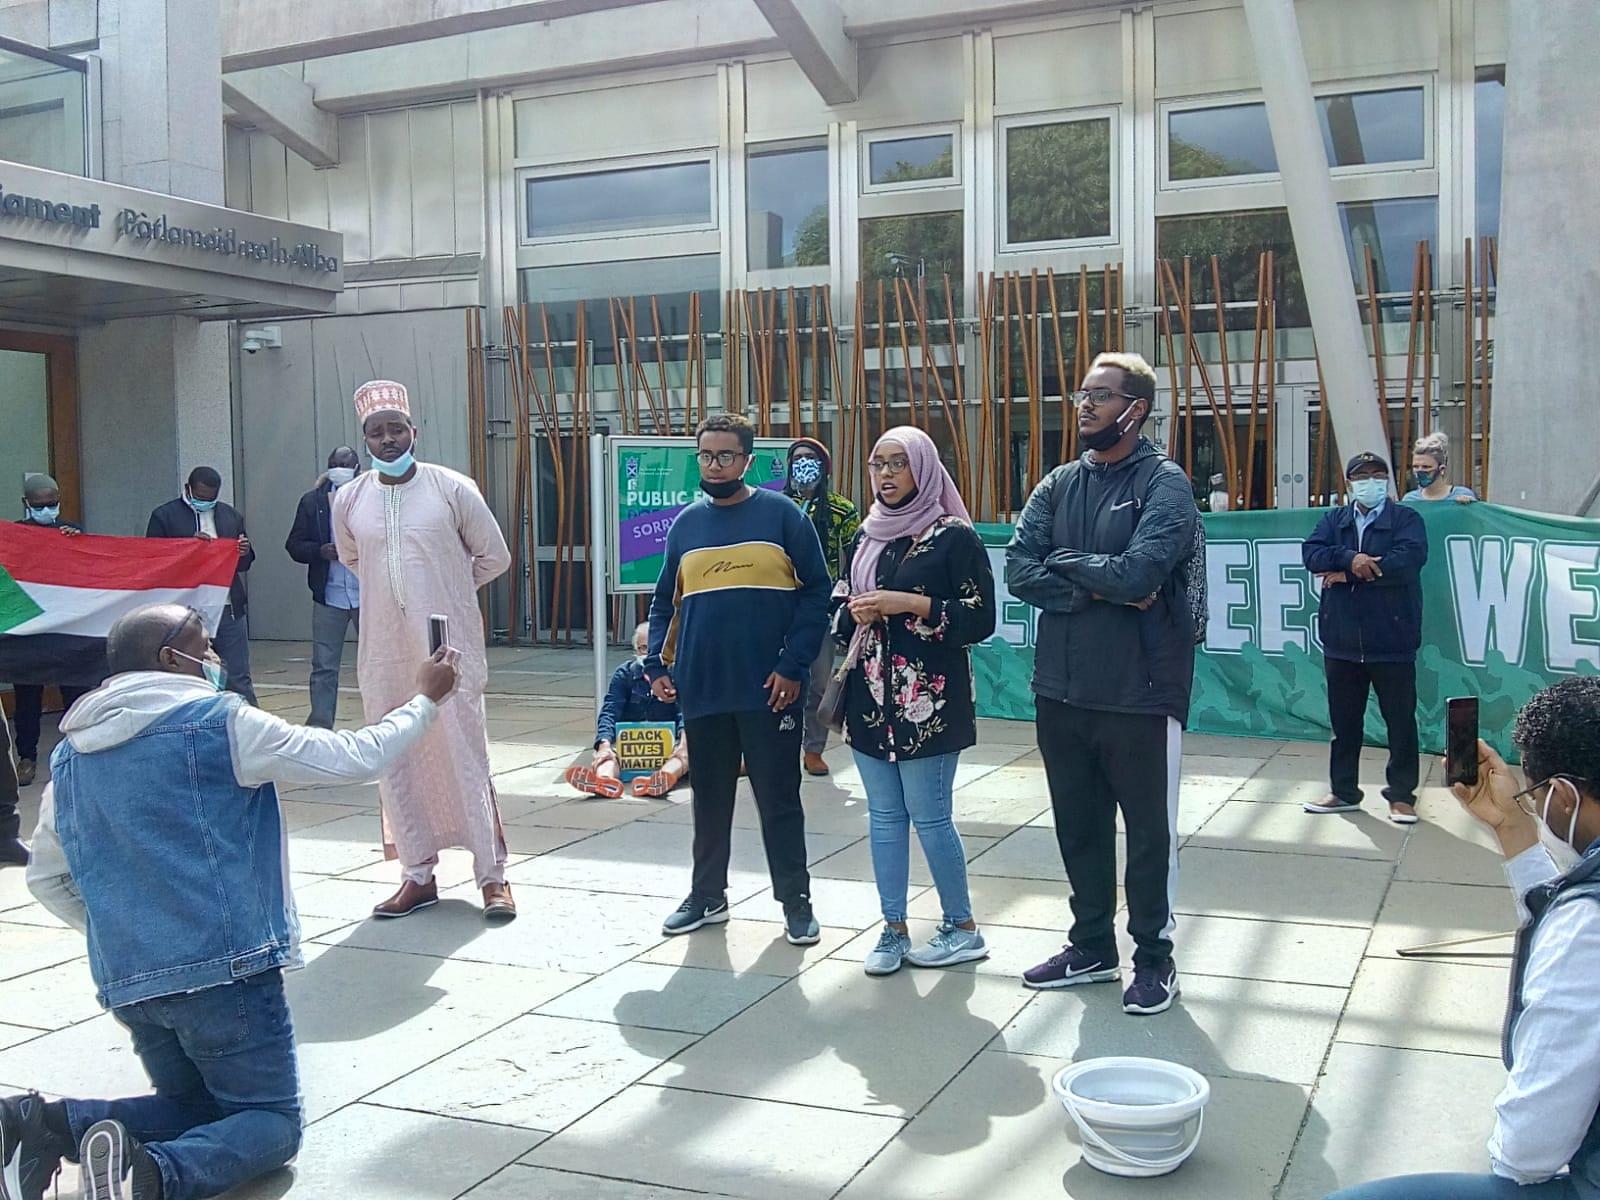 Solidarity with Scotland's Sudanese people, Edinburgh 12 July 2020